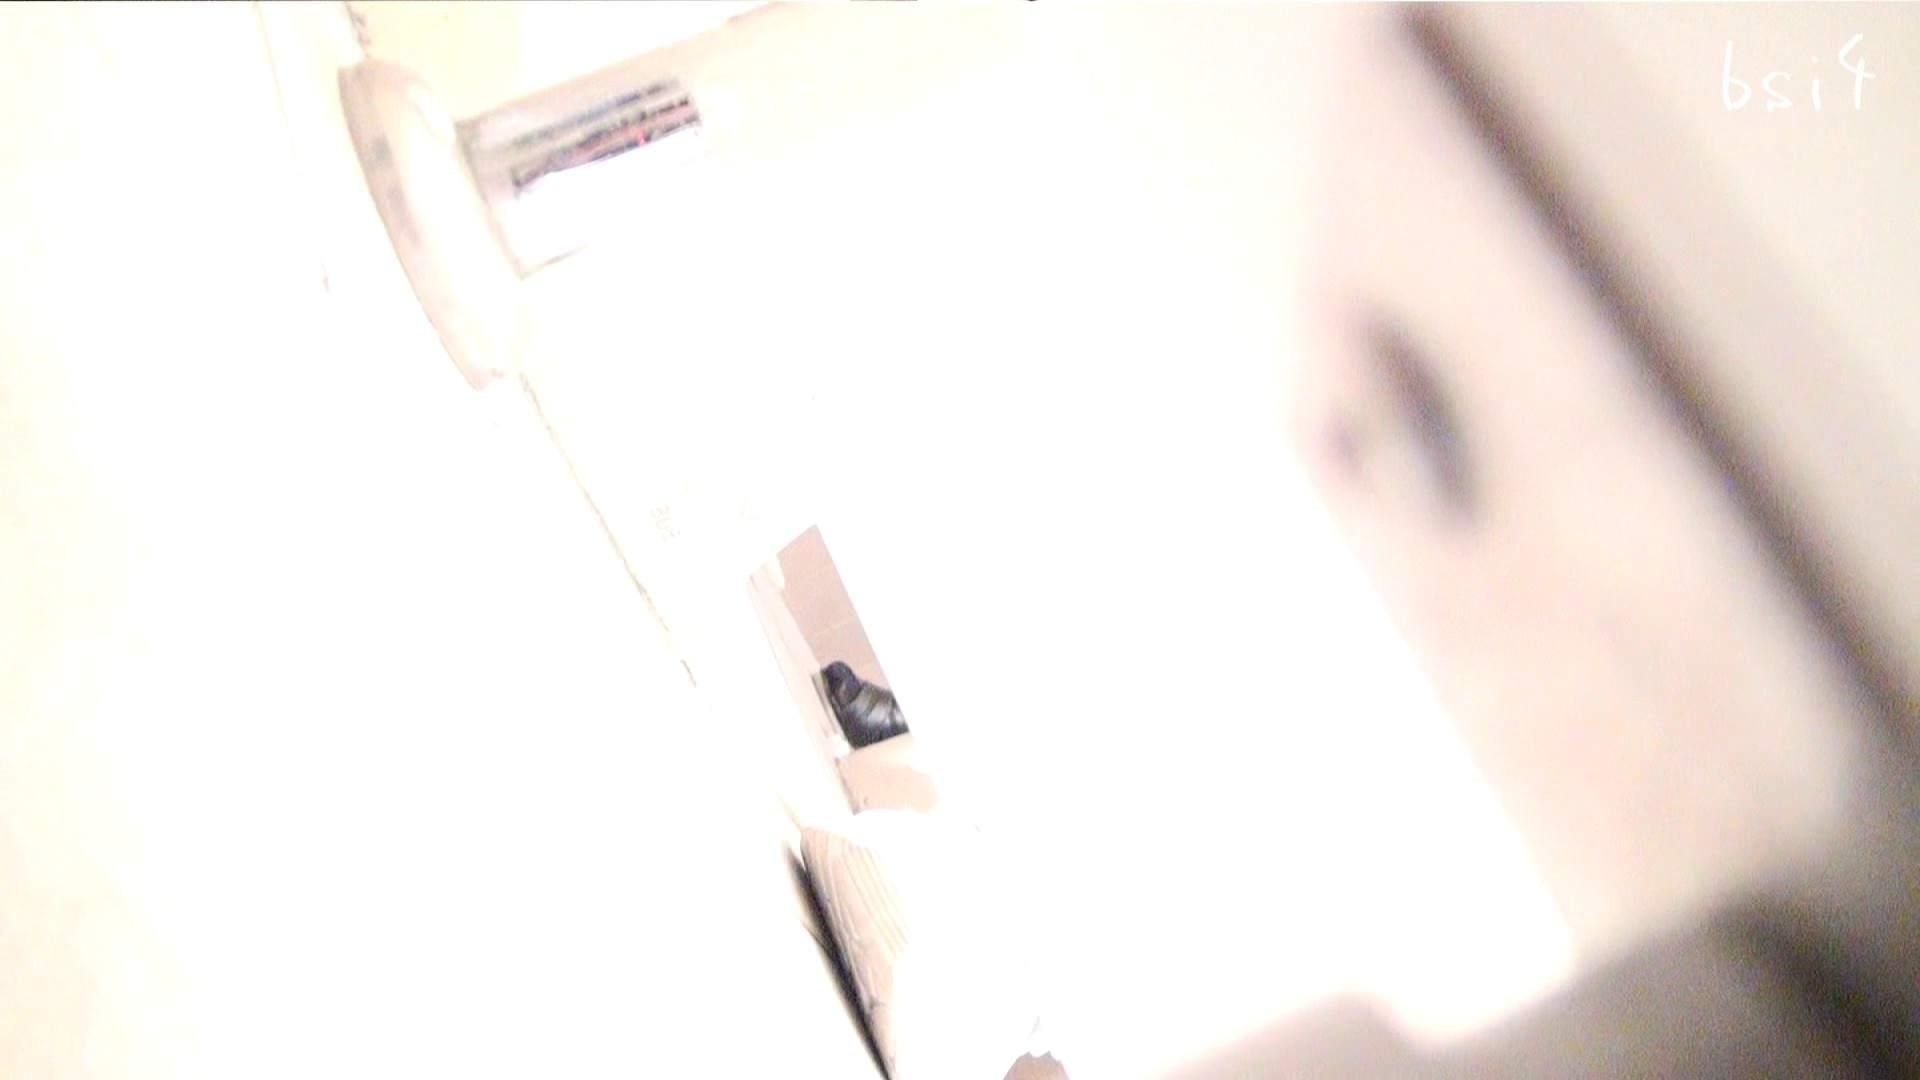 至高下半身盗撮-PREMIUM-【院内病棟編 】 vol.04 盗撮 | ナース  55画像 26